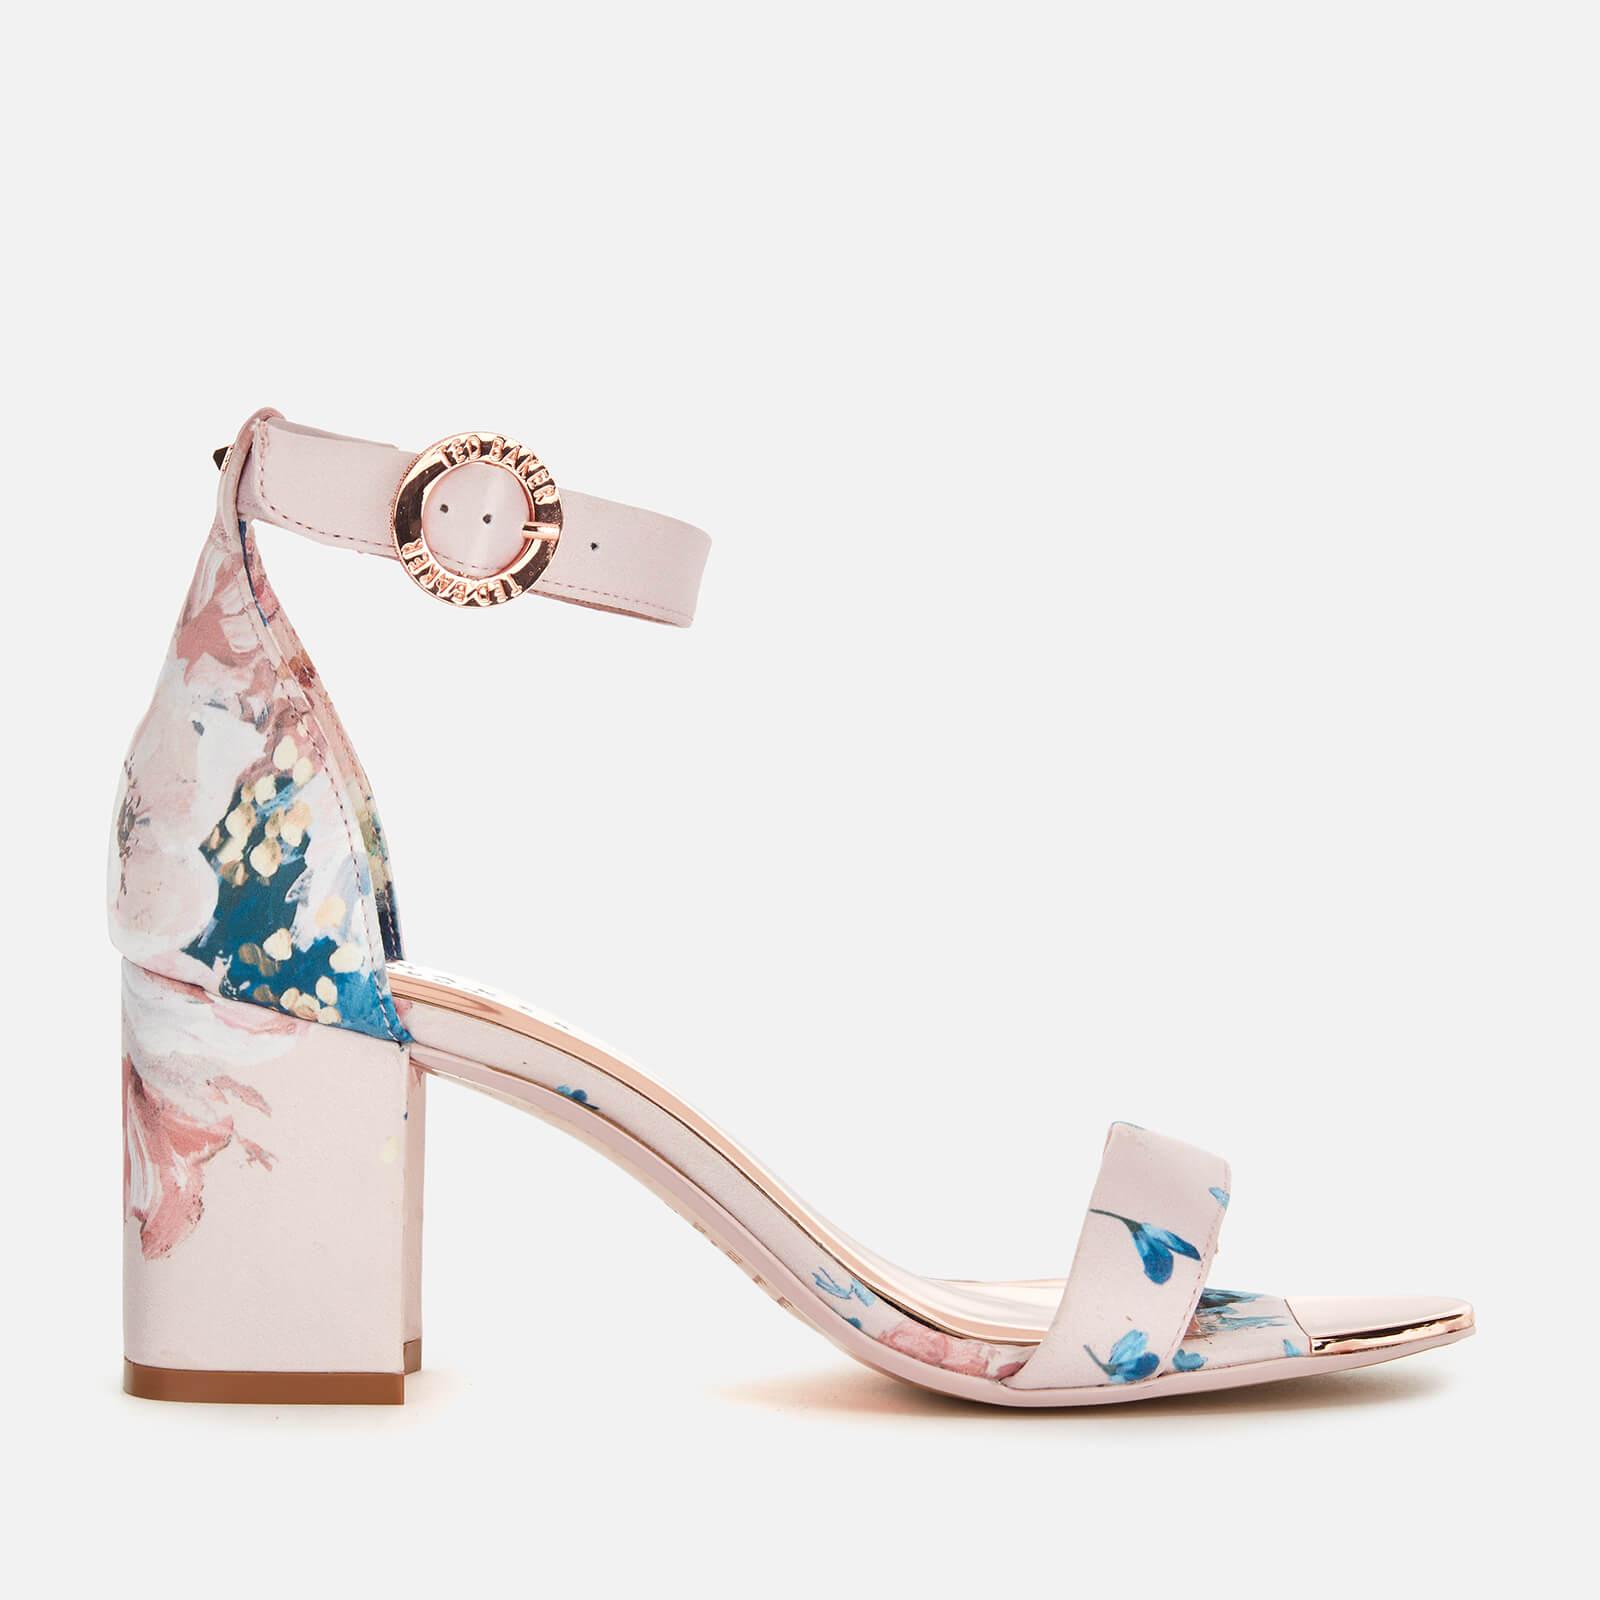 Ted Baker Women's Manyah Satin Block Heeled Sandals - Light Pink - UK 3 - Pink